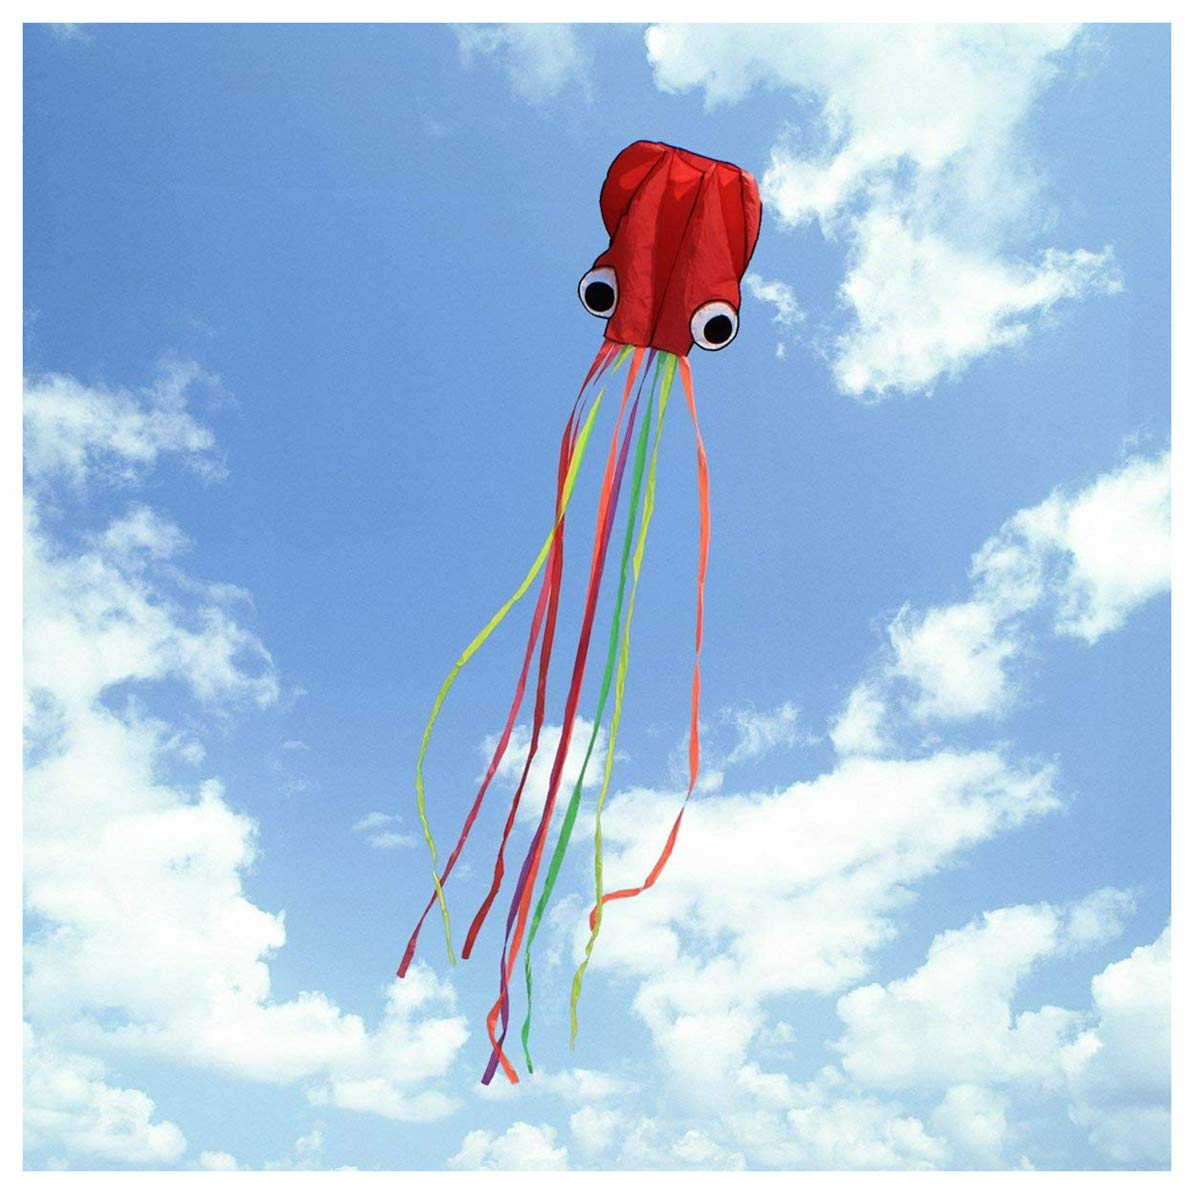 FUNTOK Drachen Kite 2 Arte Oktopus Drachen Single Line und Soft Drachen Doppellinie (Oktopus Drachen Single Line) Youy